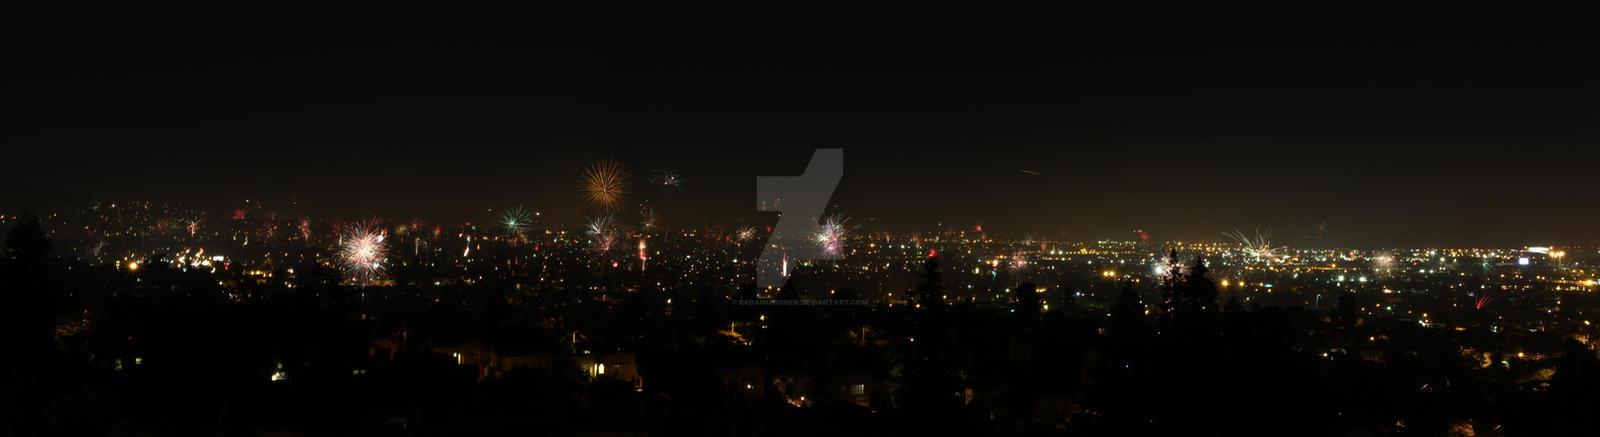 East Oakland Skyline: 7/4/13 by badaimarcher on DeviantArt